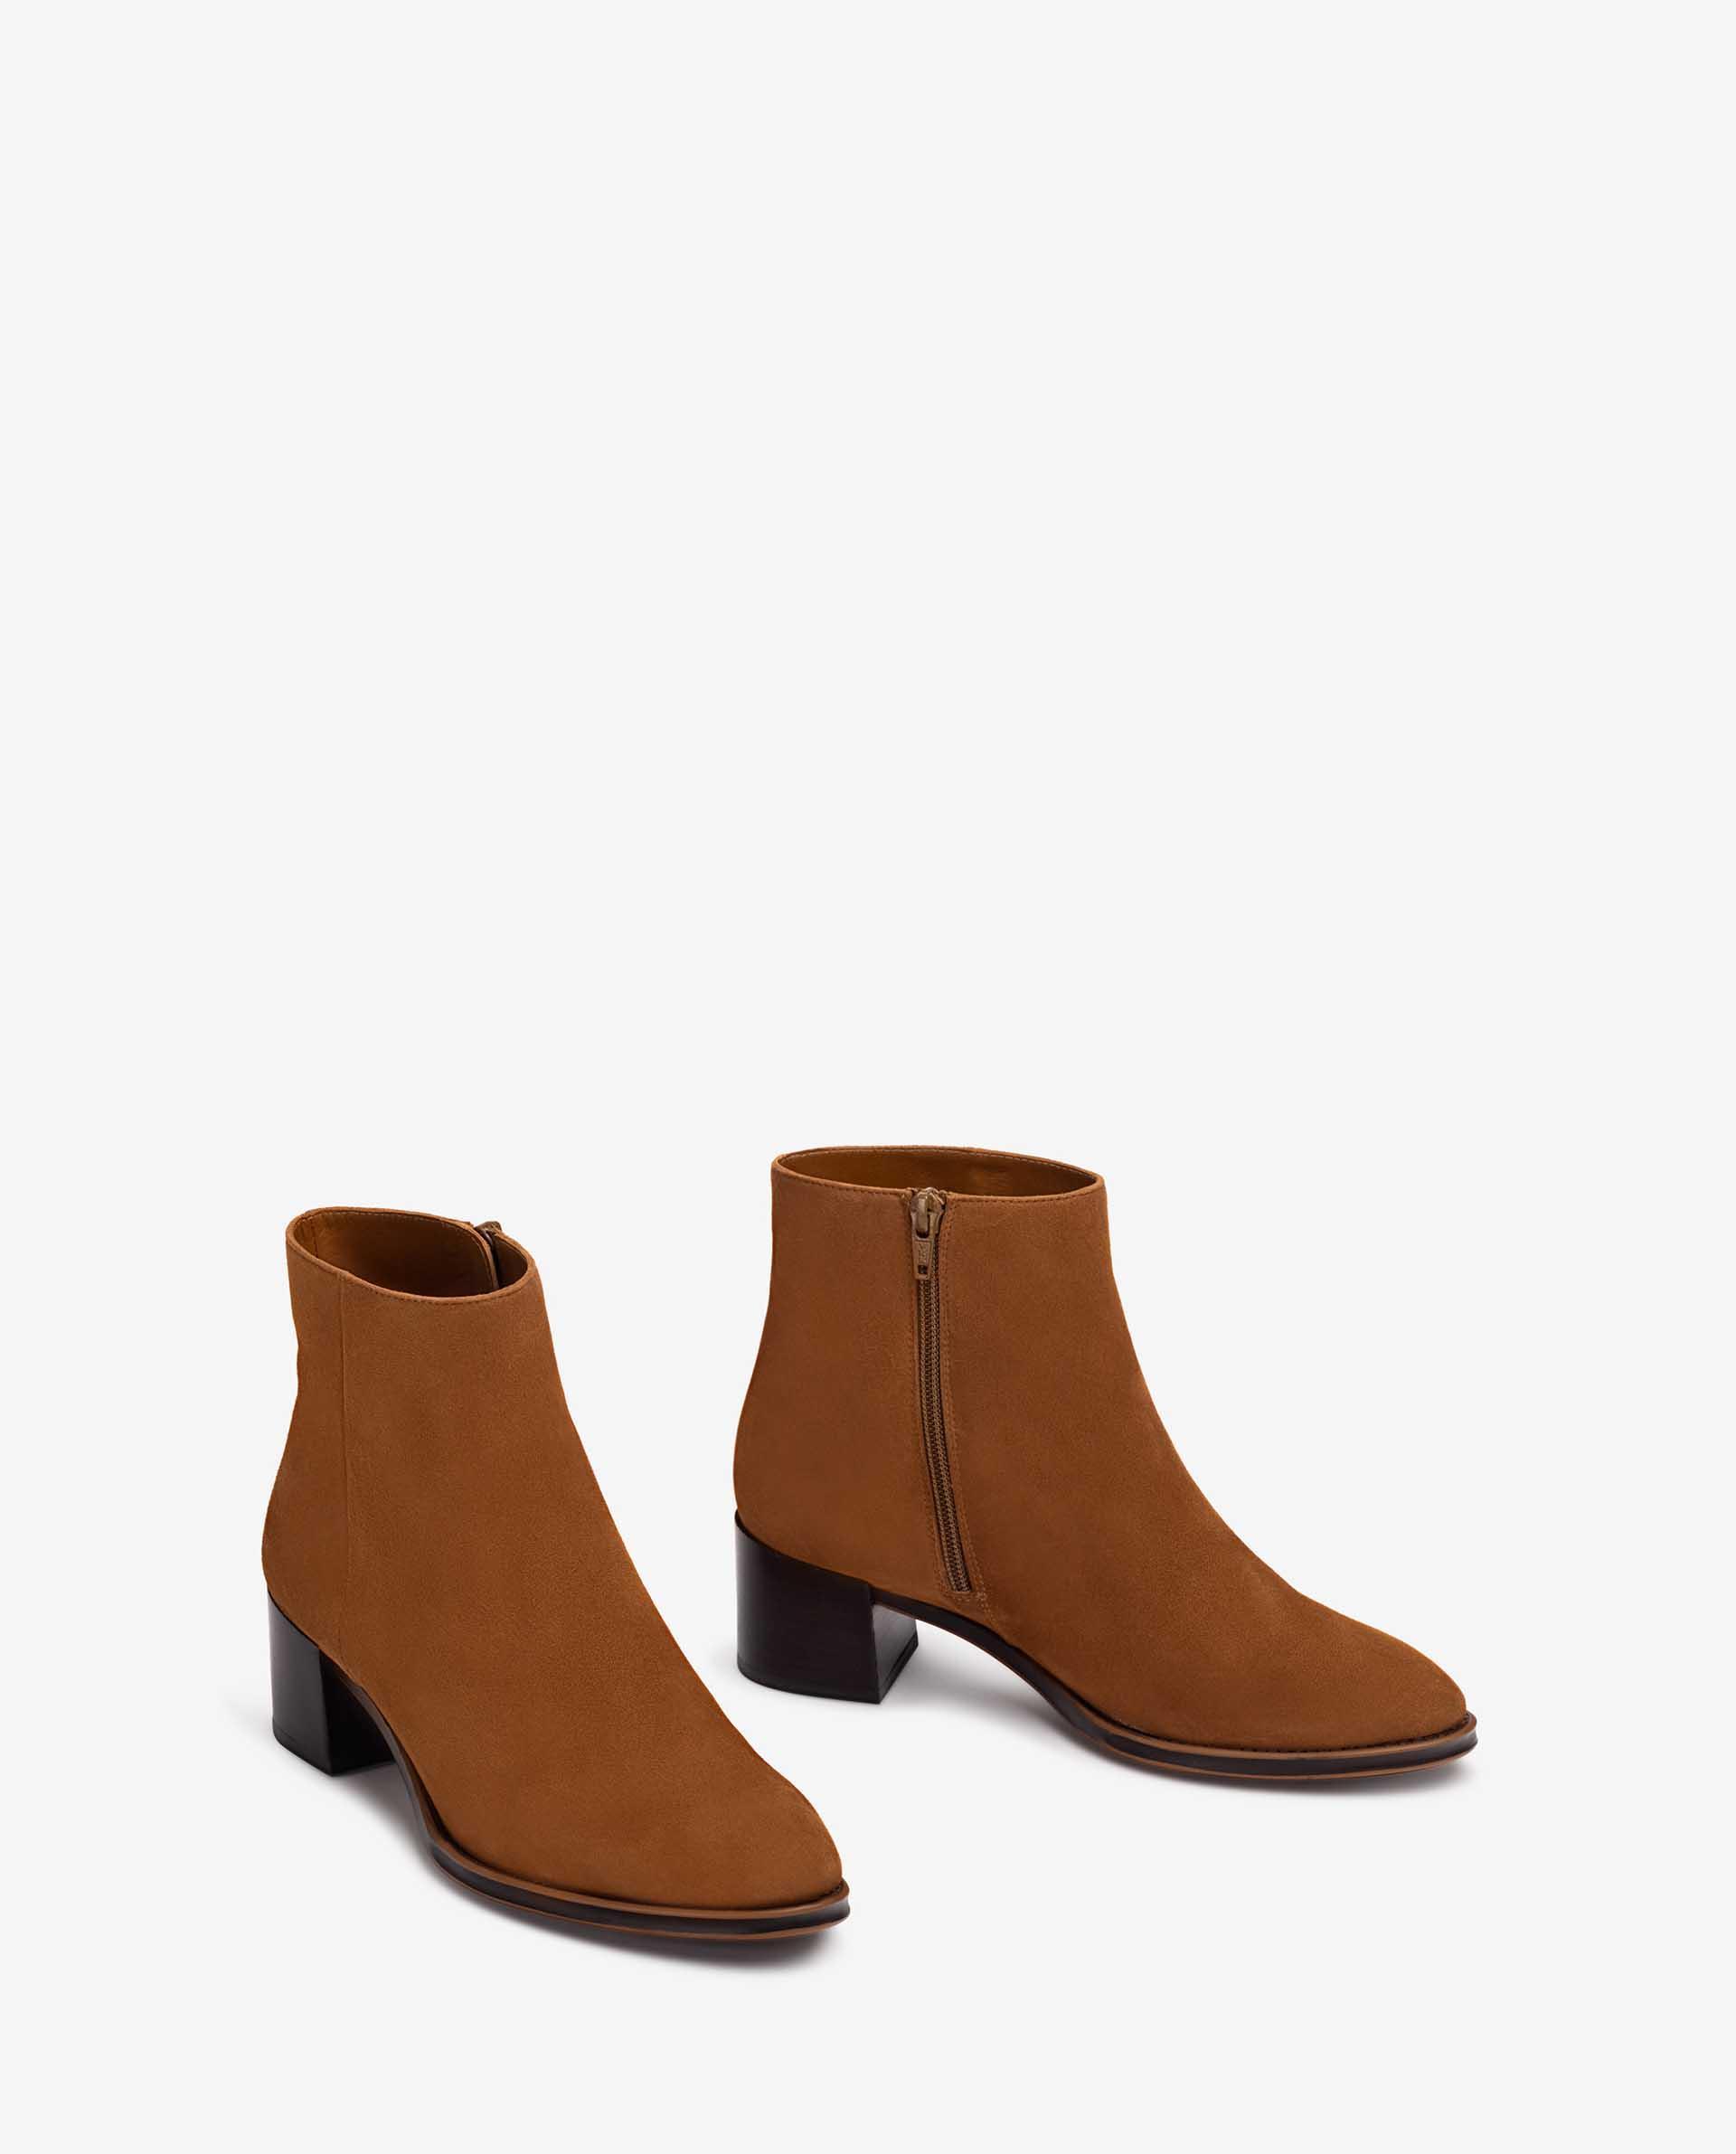 Unisa Ankle boots MOCEO_KS cobnut